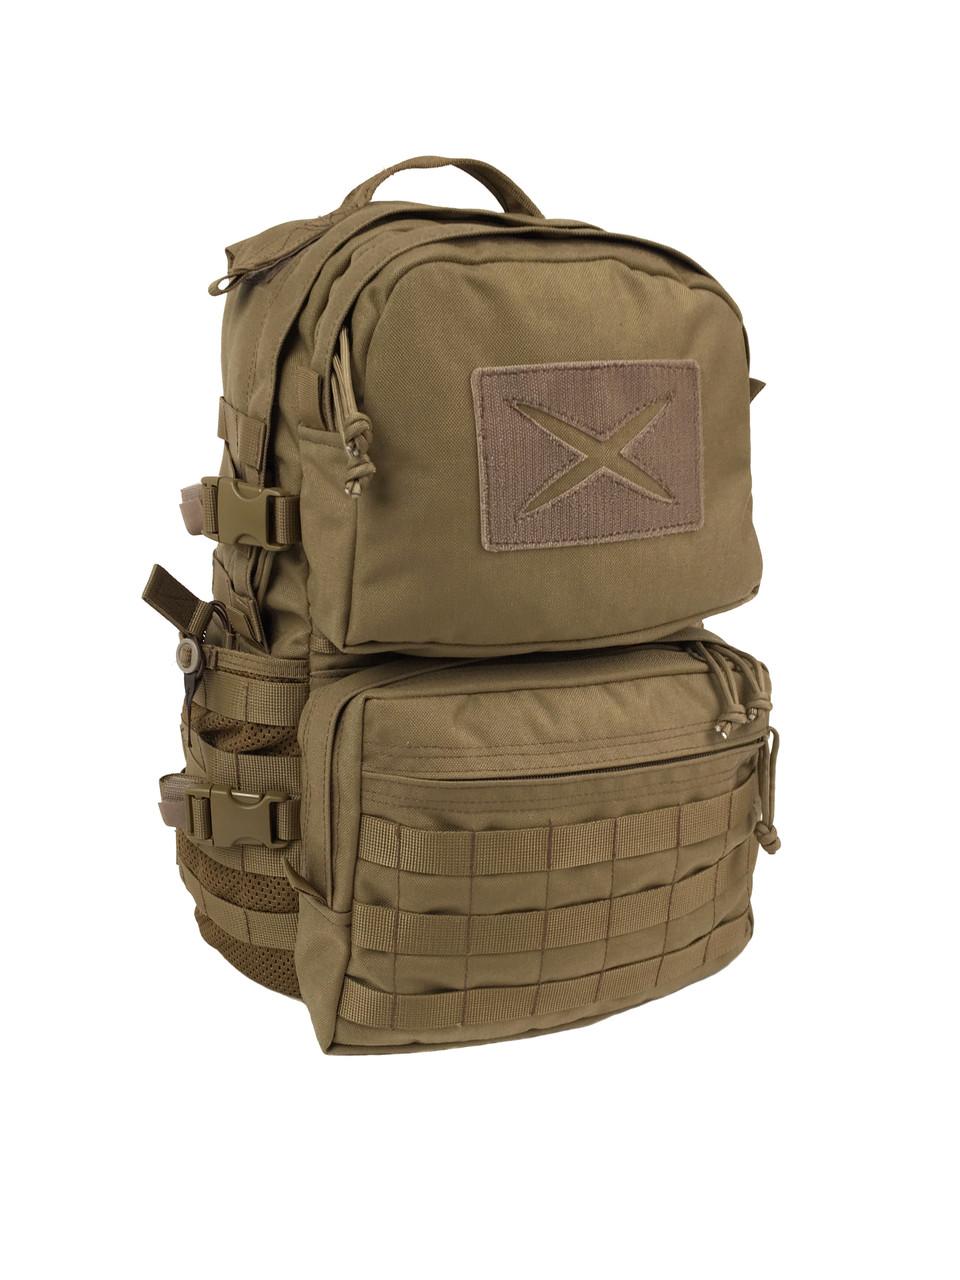 Тактический рюкзак М2 Coyote